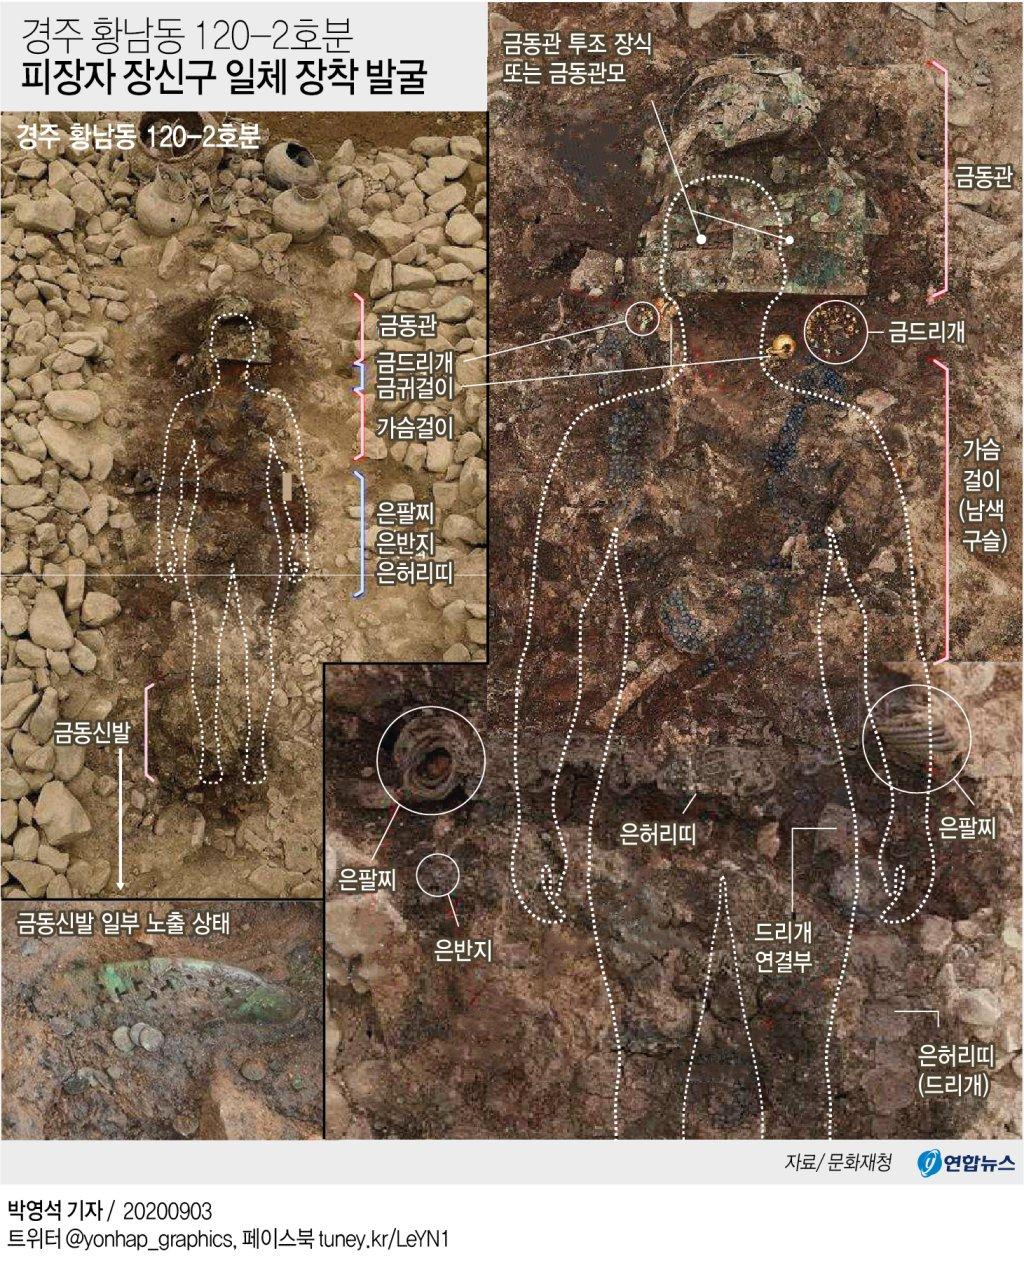 <span class=bd>[그래픽]</span> 경주 황남동 120-2호분 피장자 1장신구 일체 장착 발굴